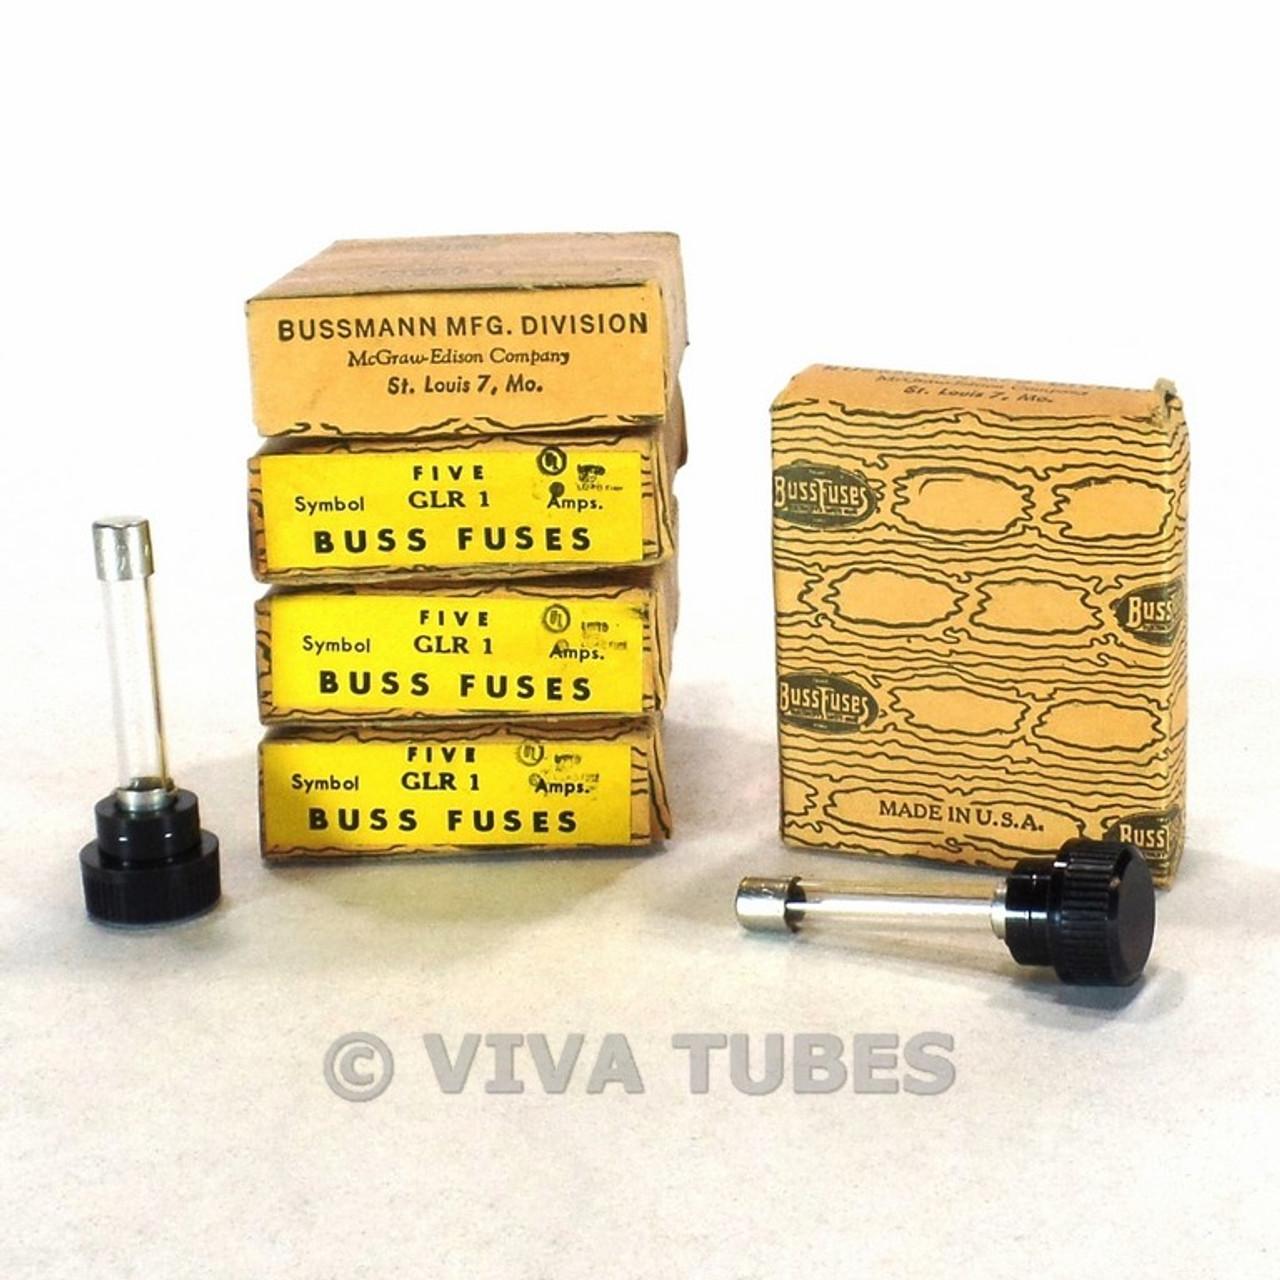 medium resolution of set of 20 nos nib vintage bussman fuses type glr 1 aamp 300 v panel mount fuses viva tubes